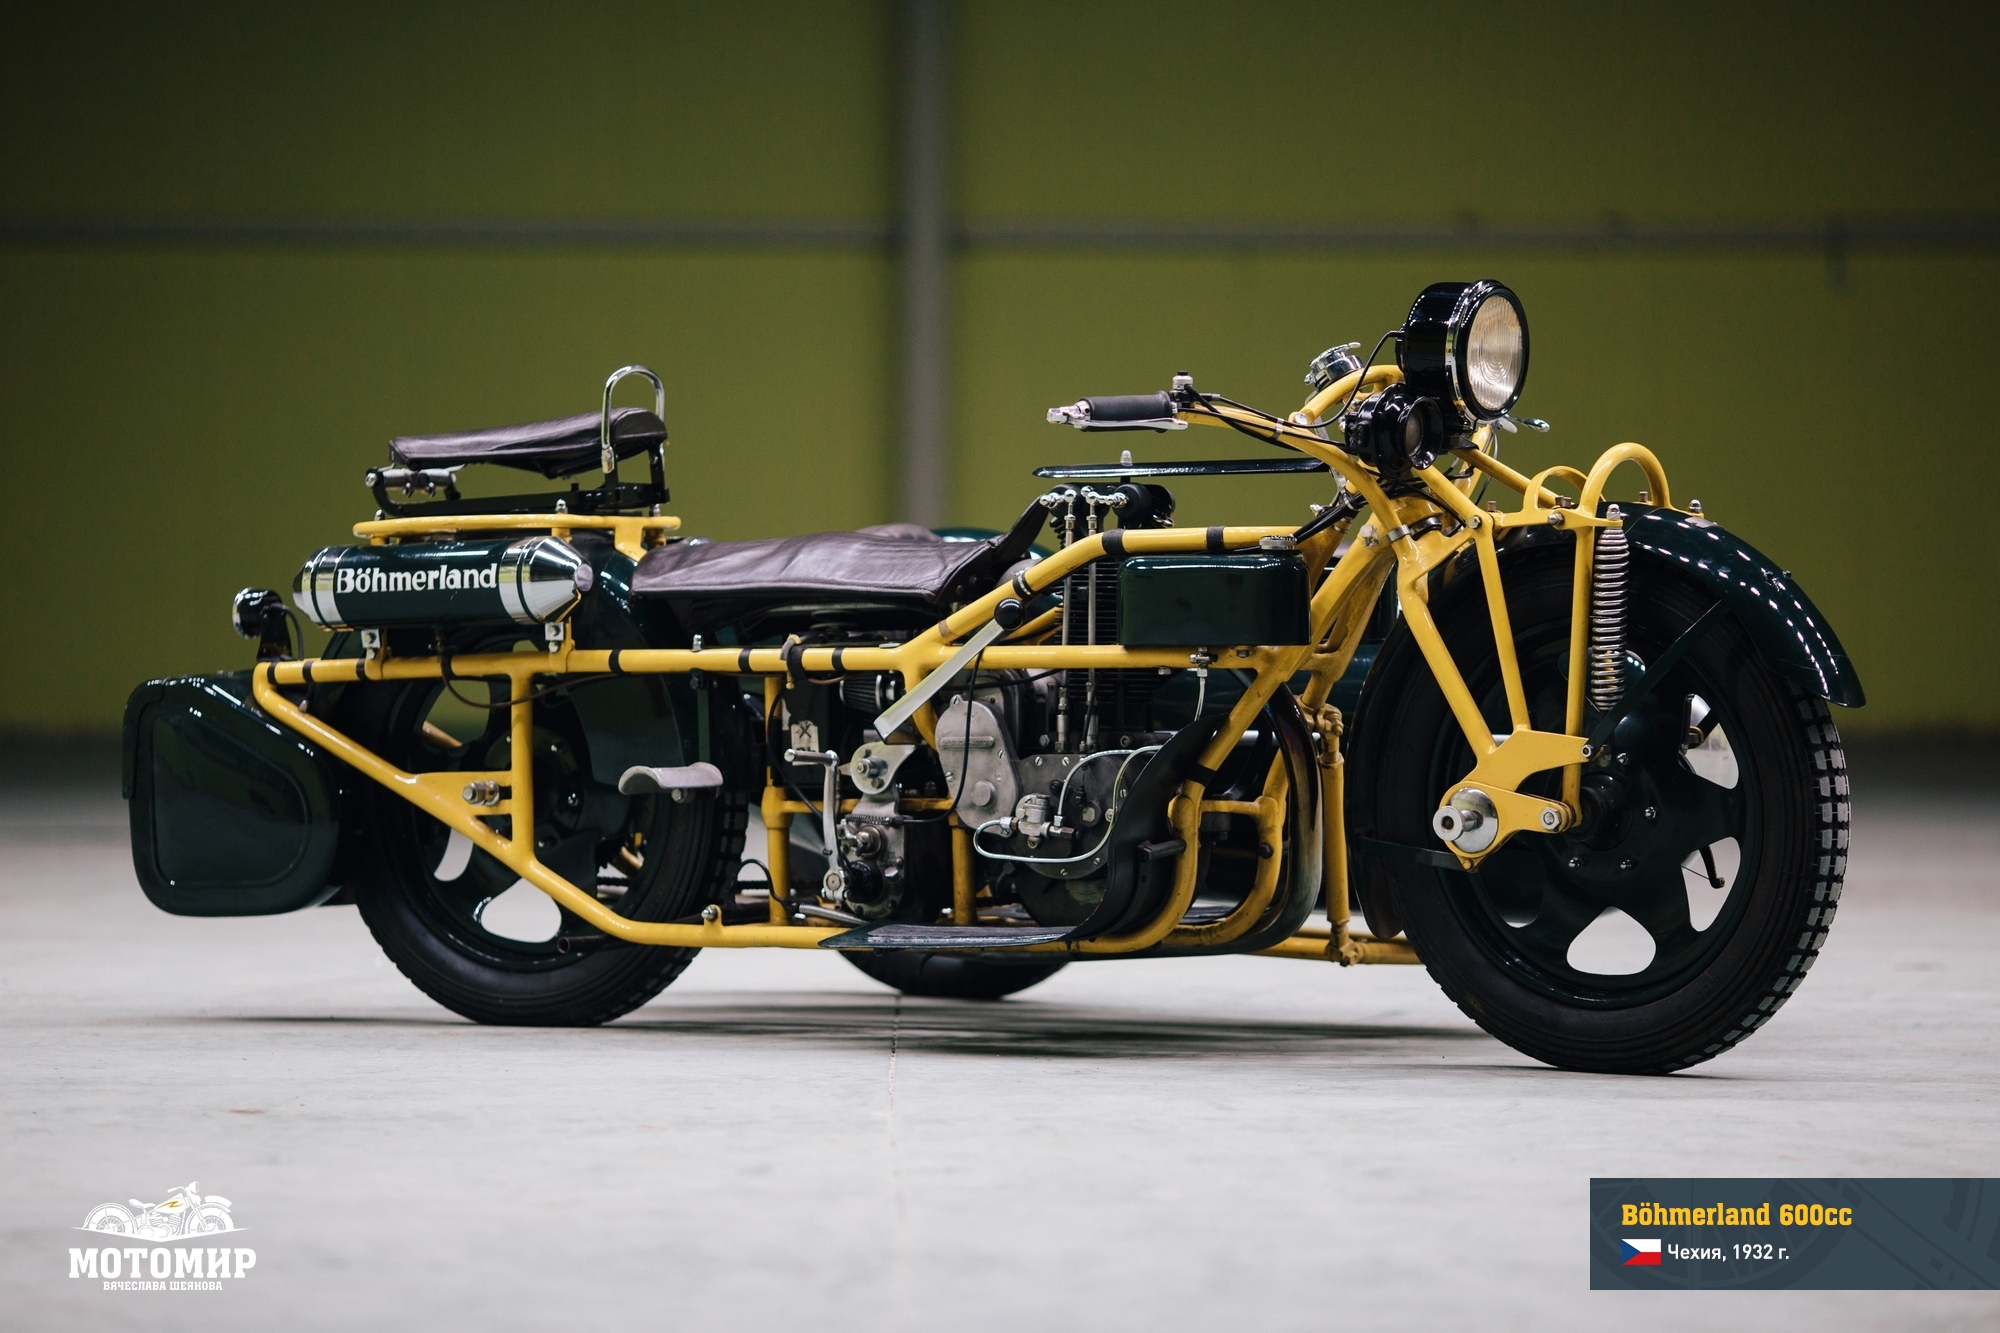 bohmerland-600cc-201502-web-08